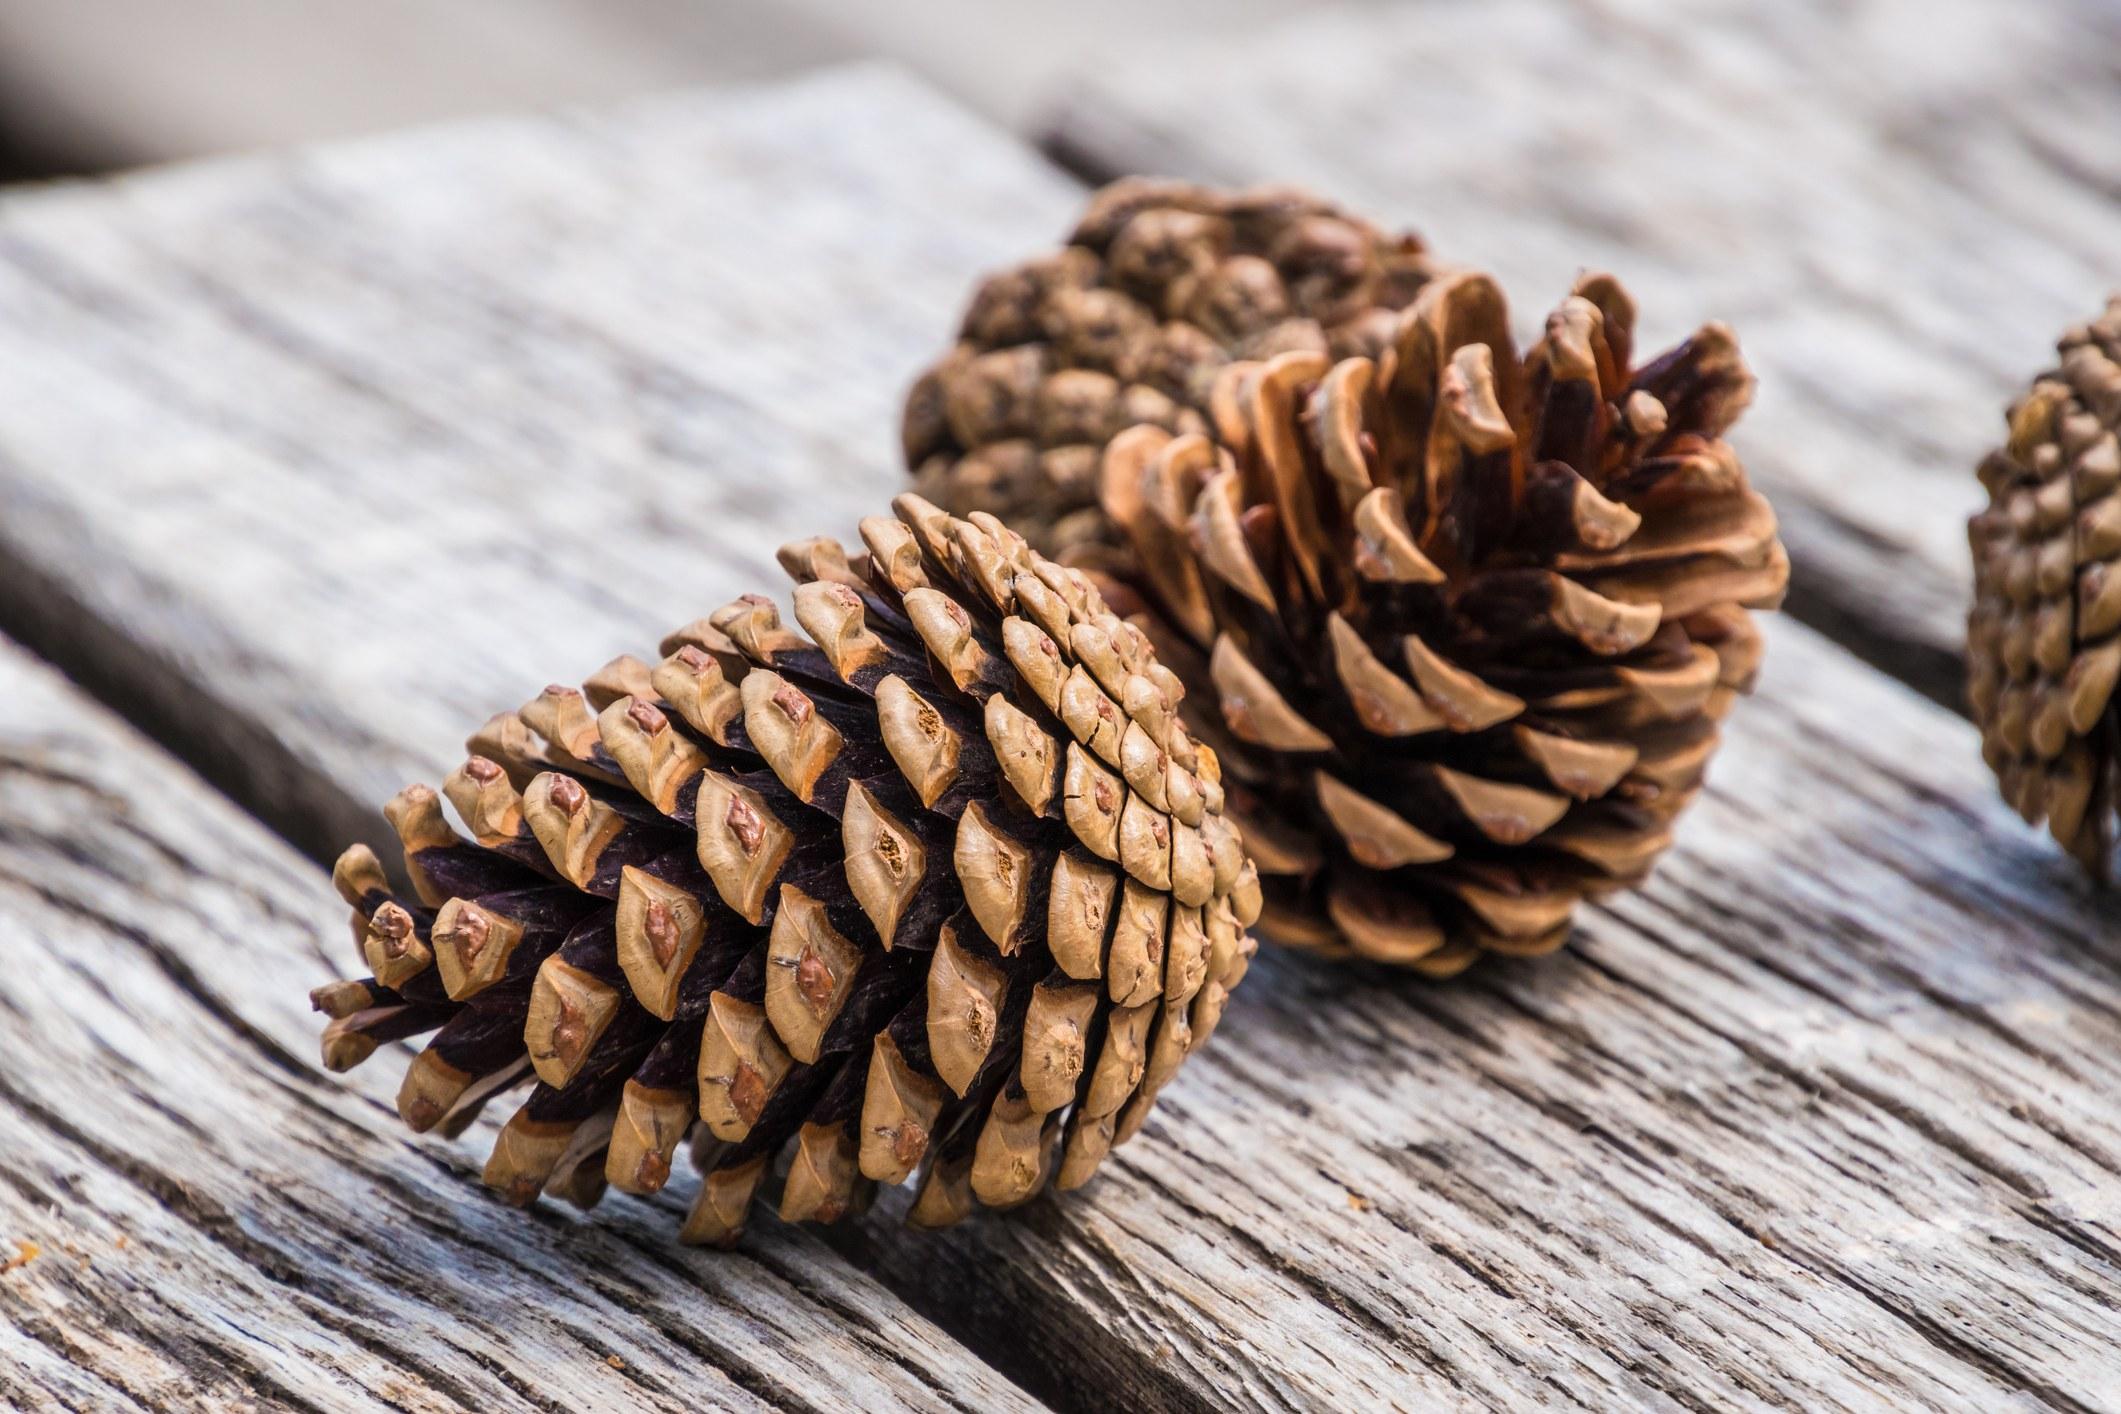 Fir pine cones lying on wood planks